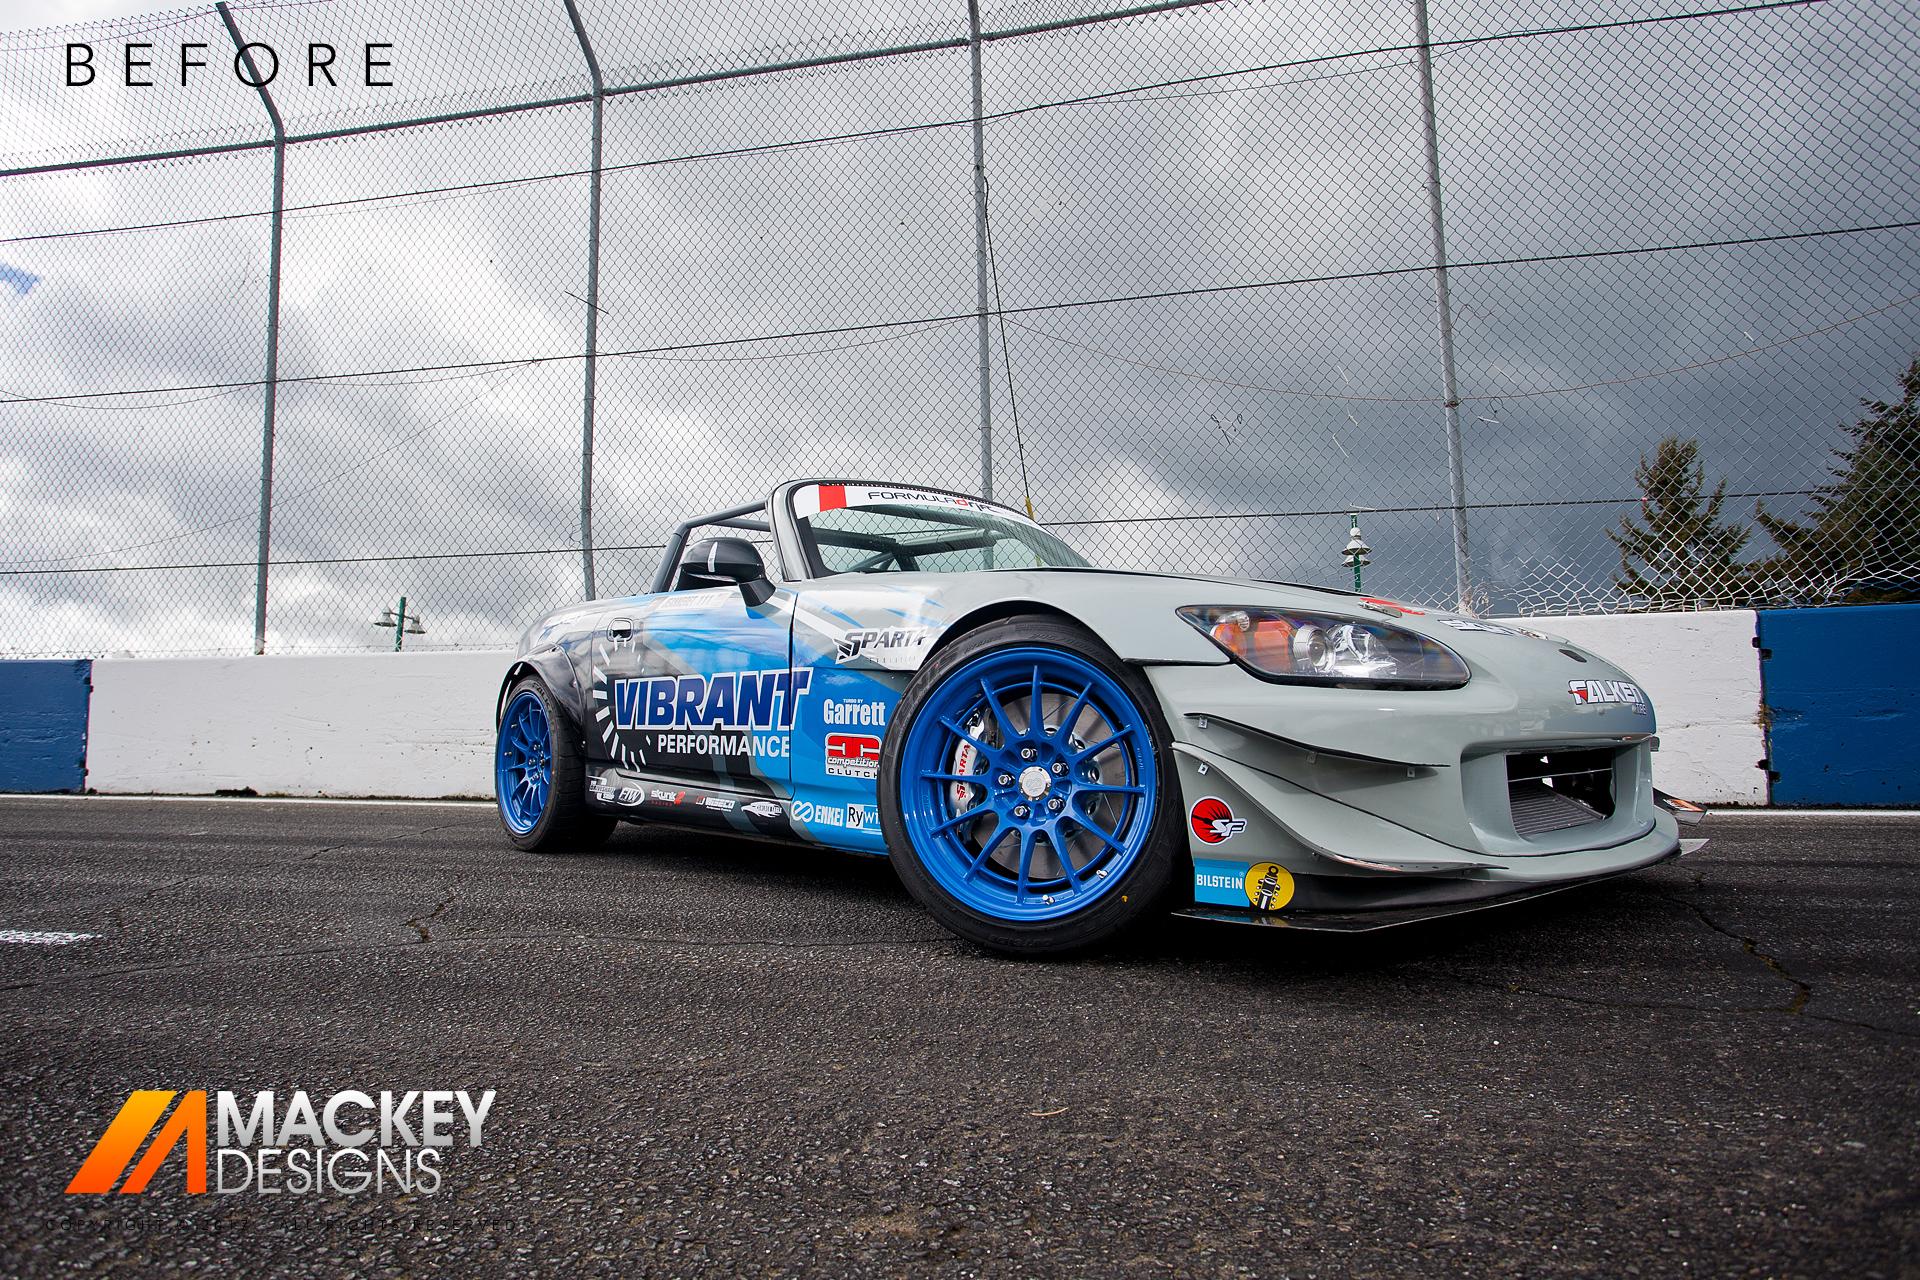 Automotive Photographer - Seattle - Josh Mackey - Formula DRIFT S2000 Before